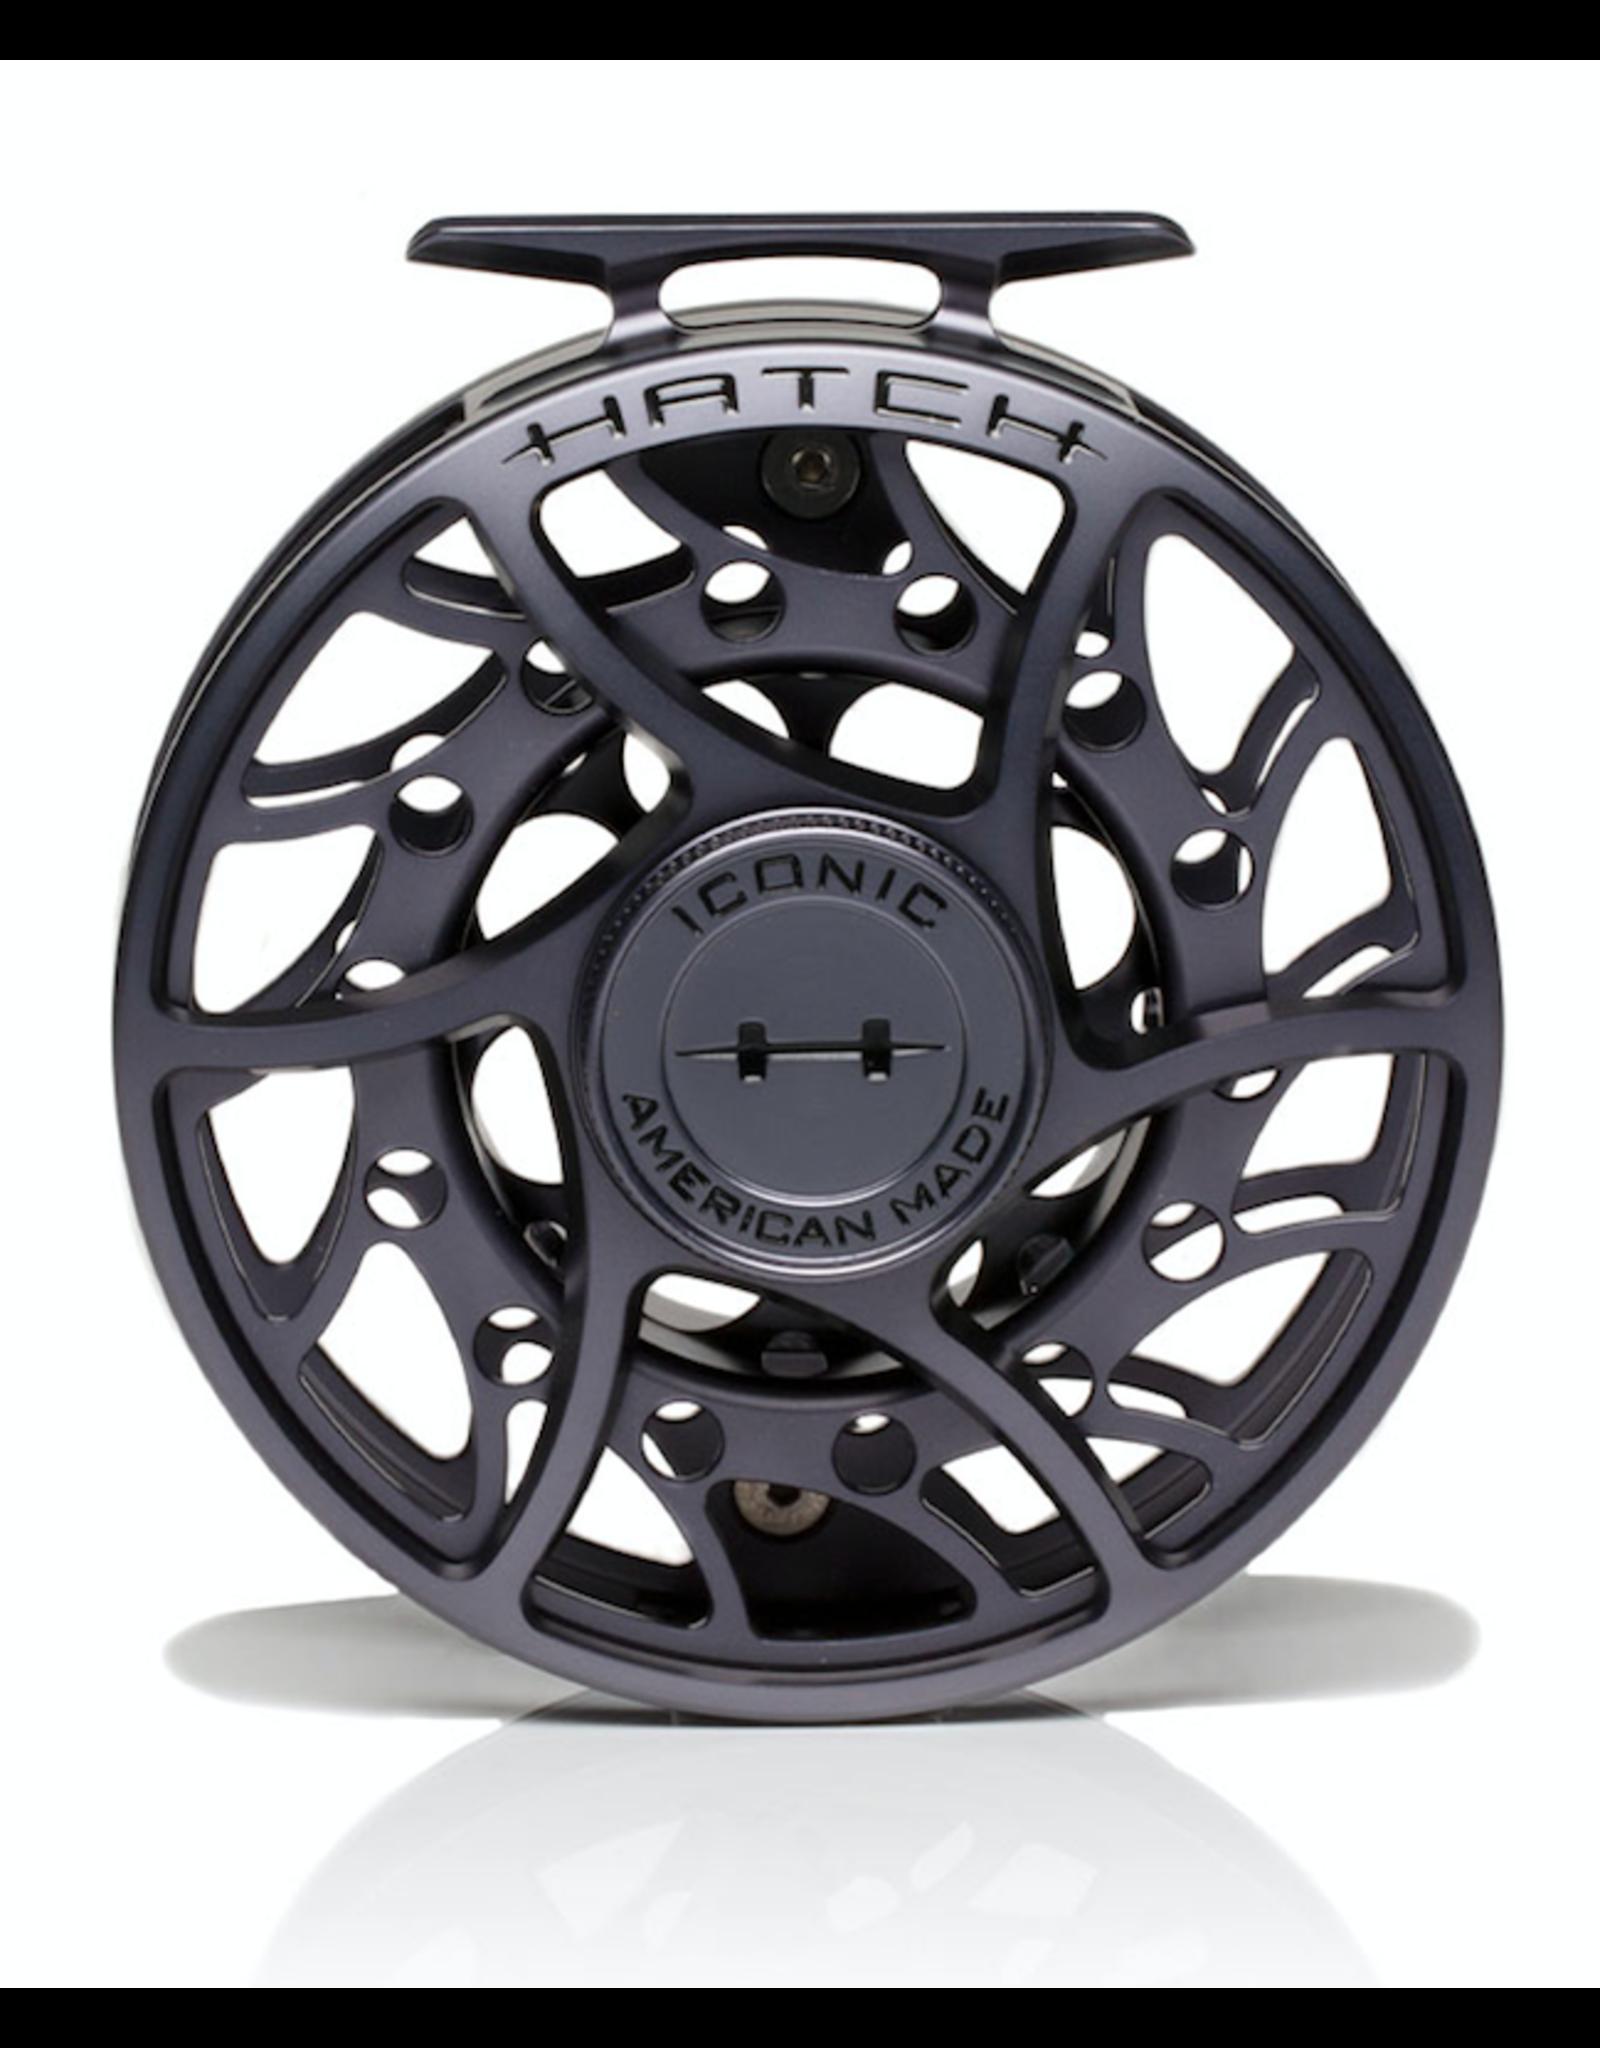 Hatch HATCH Iconic 9 Plus Reel (Grey/ Black) Mid Arbor